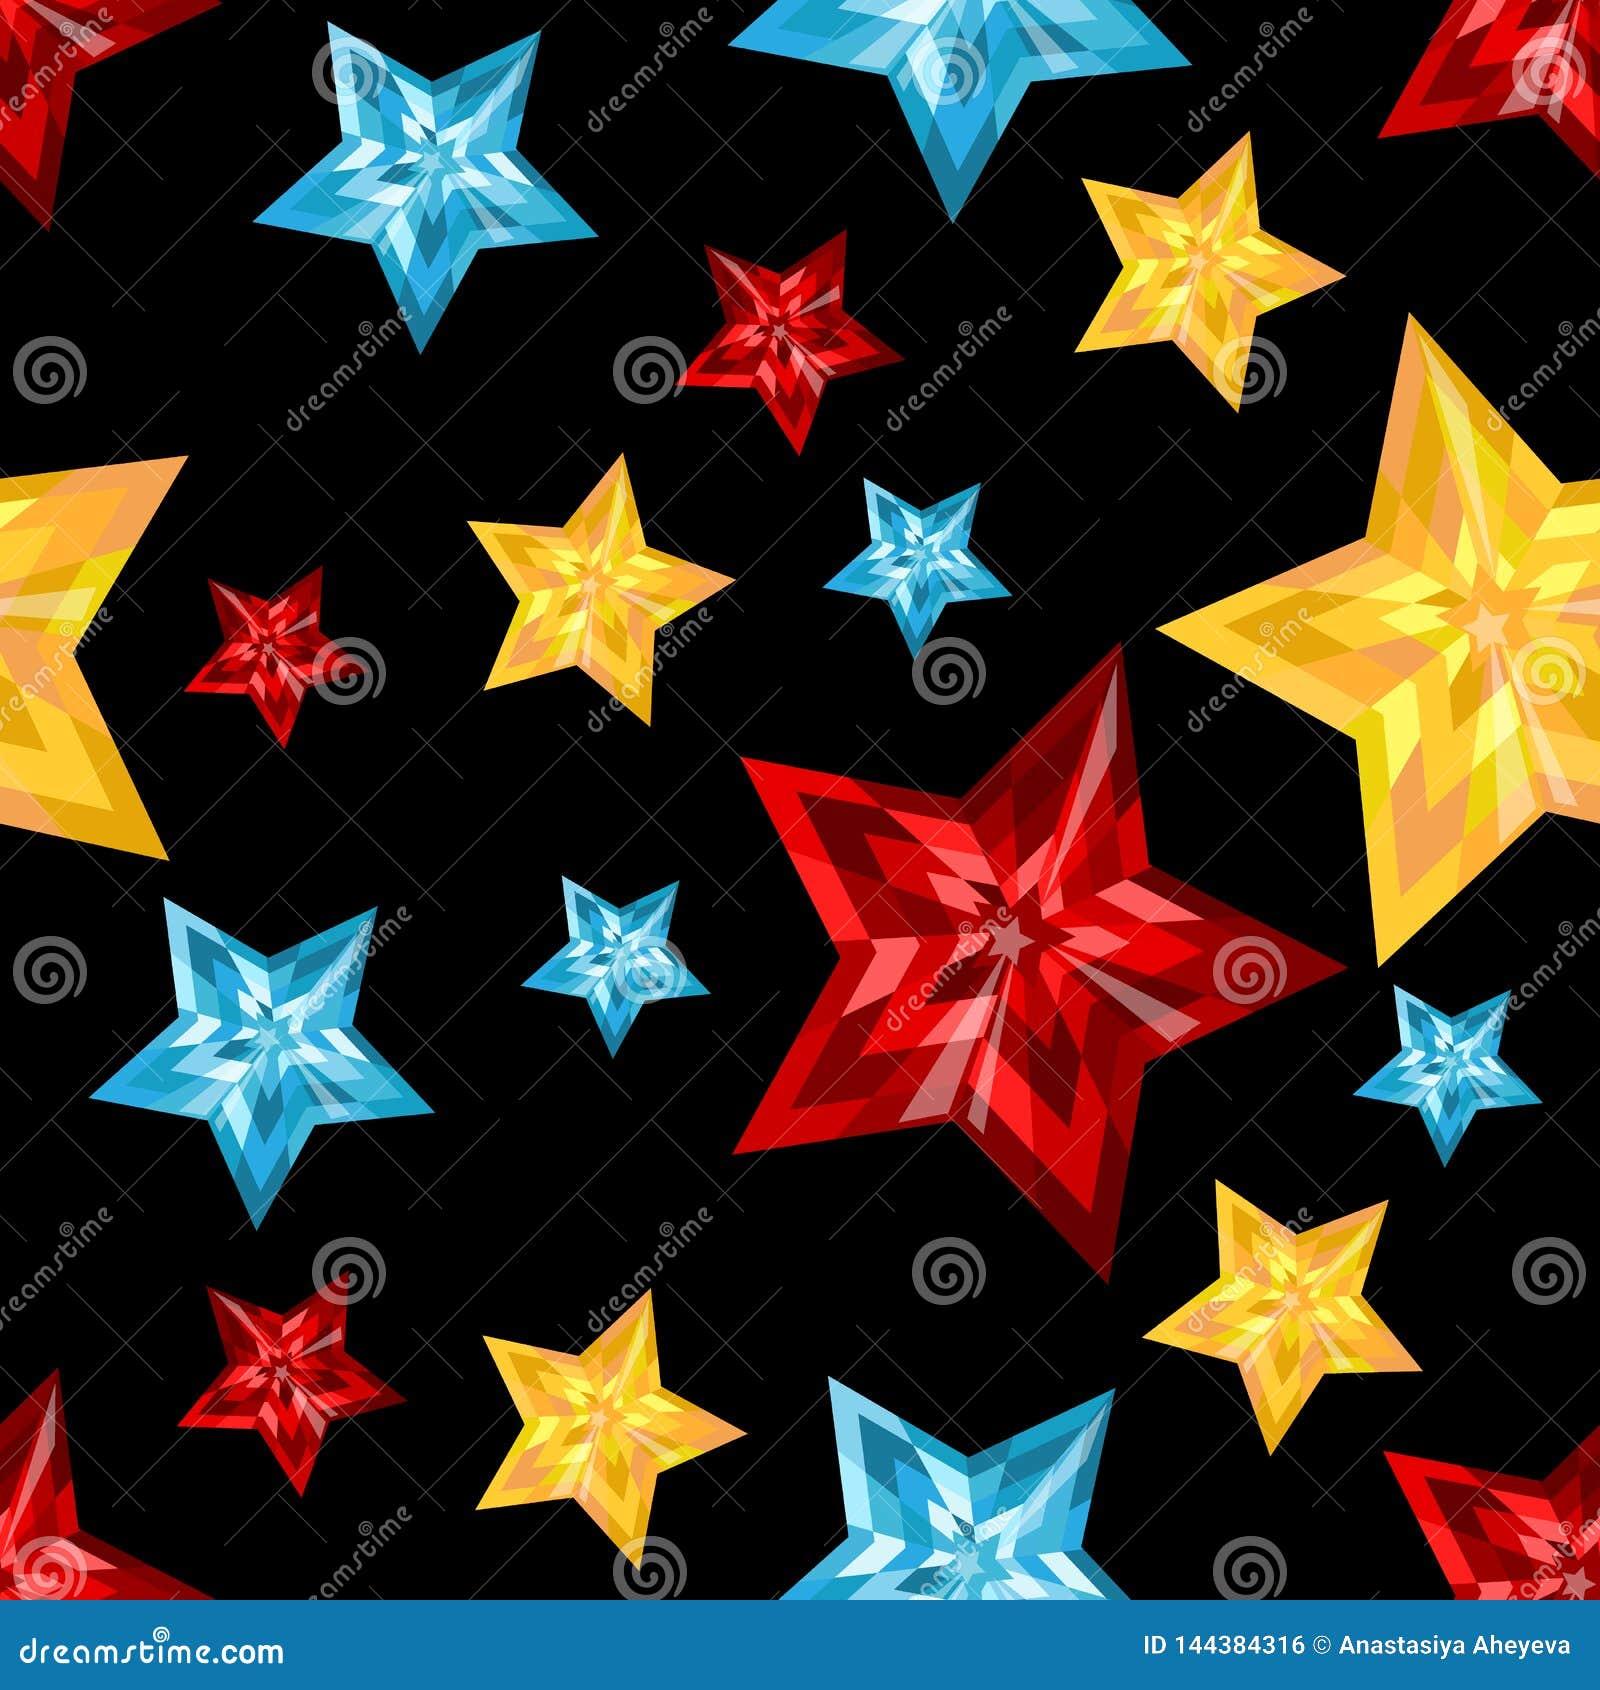 Stars. Precious stones on a black background. Jewelry cut.